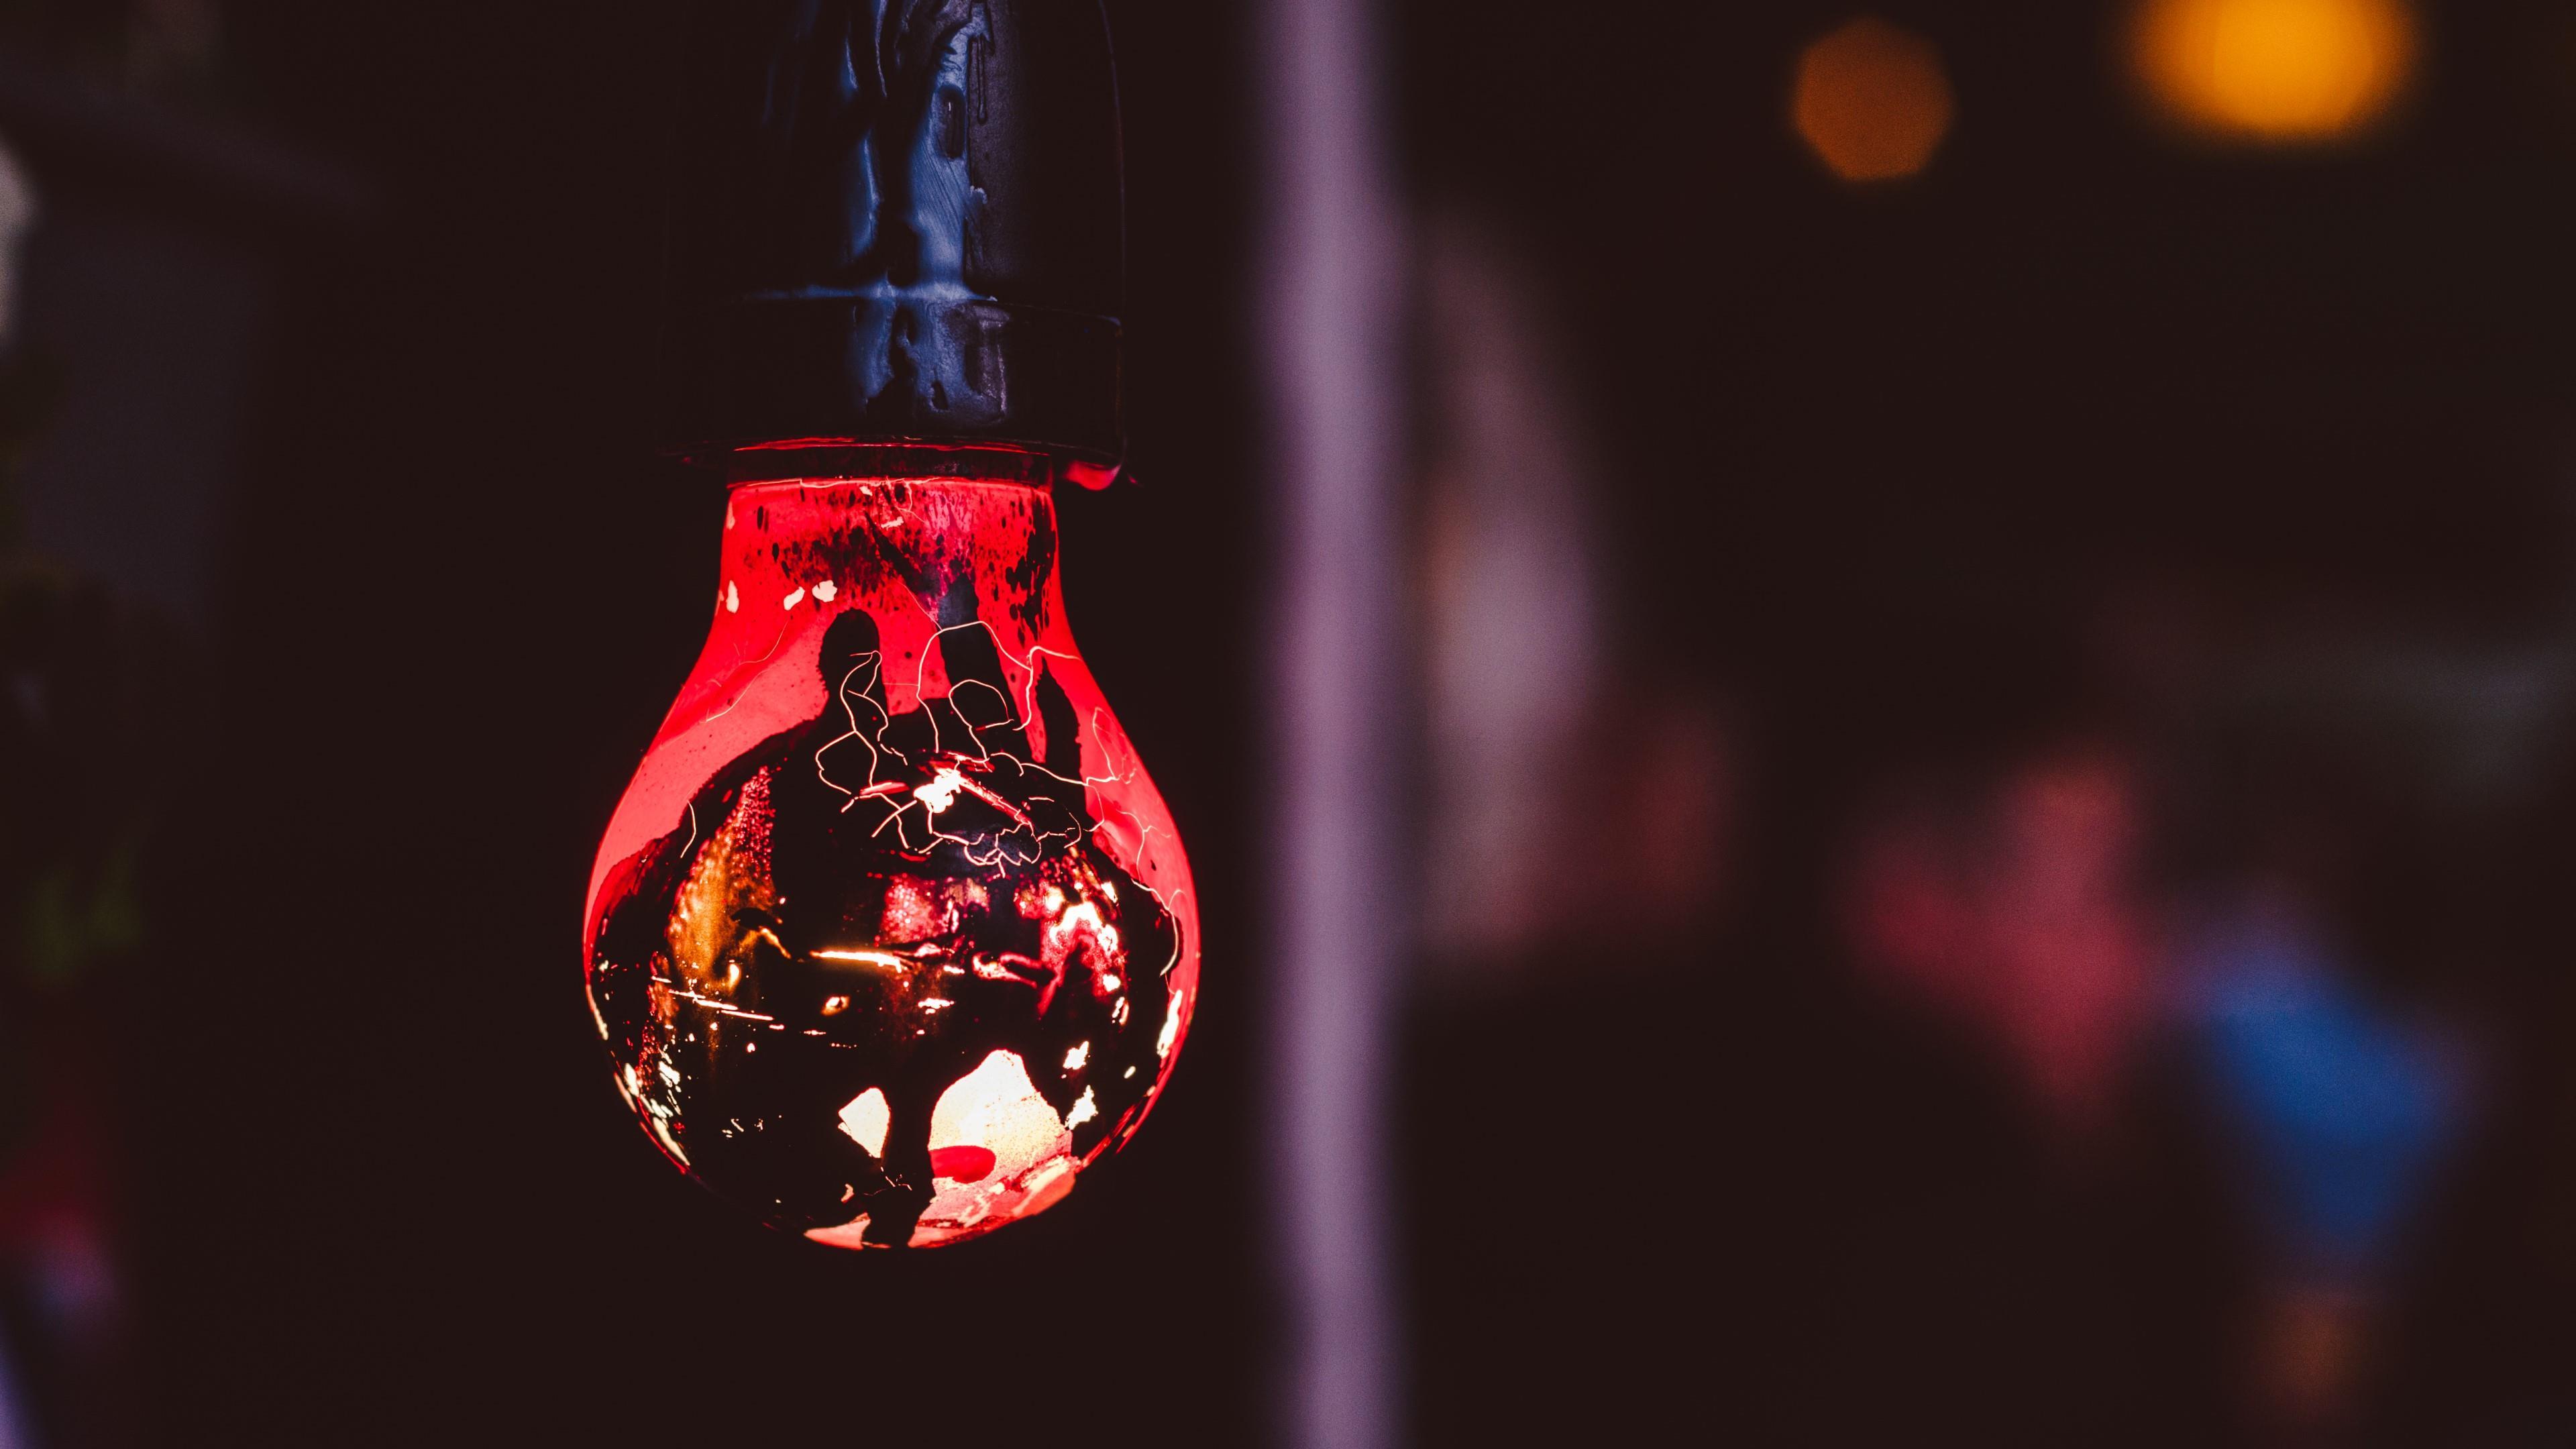 red light bulb wallpaper hd 65929